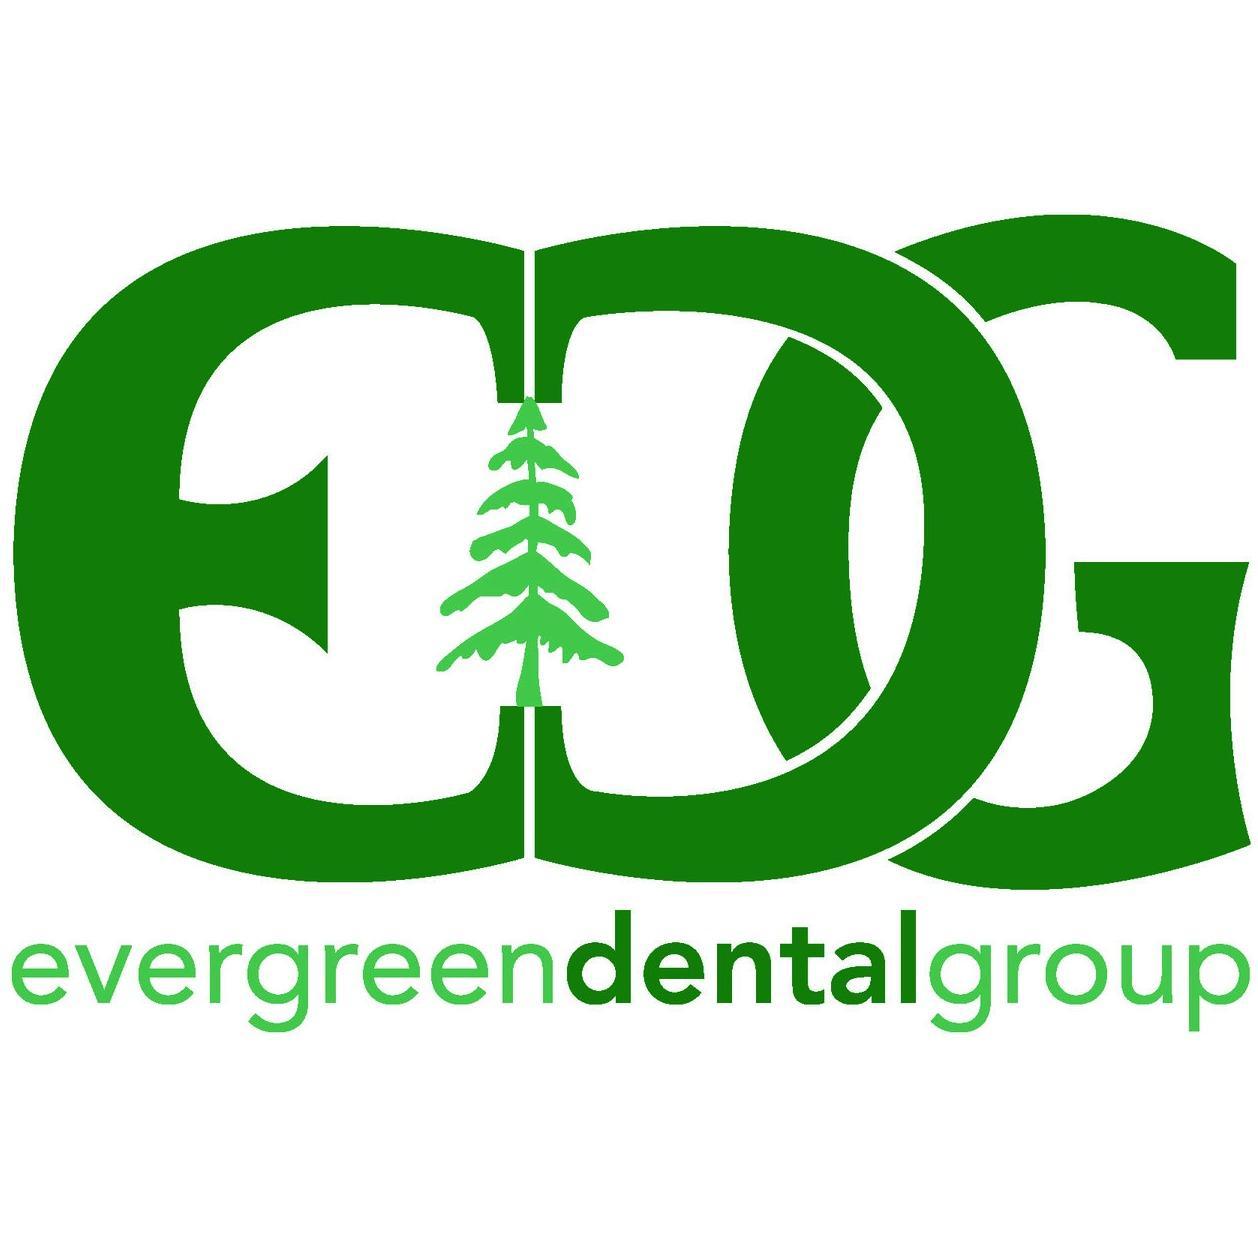 Evergreen Dental Group - Evergreen, CO - Dentists & Dental Services